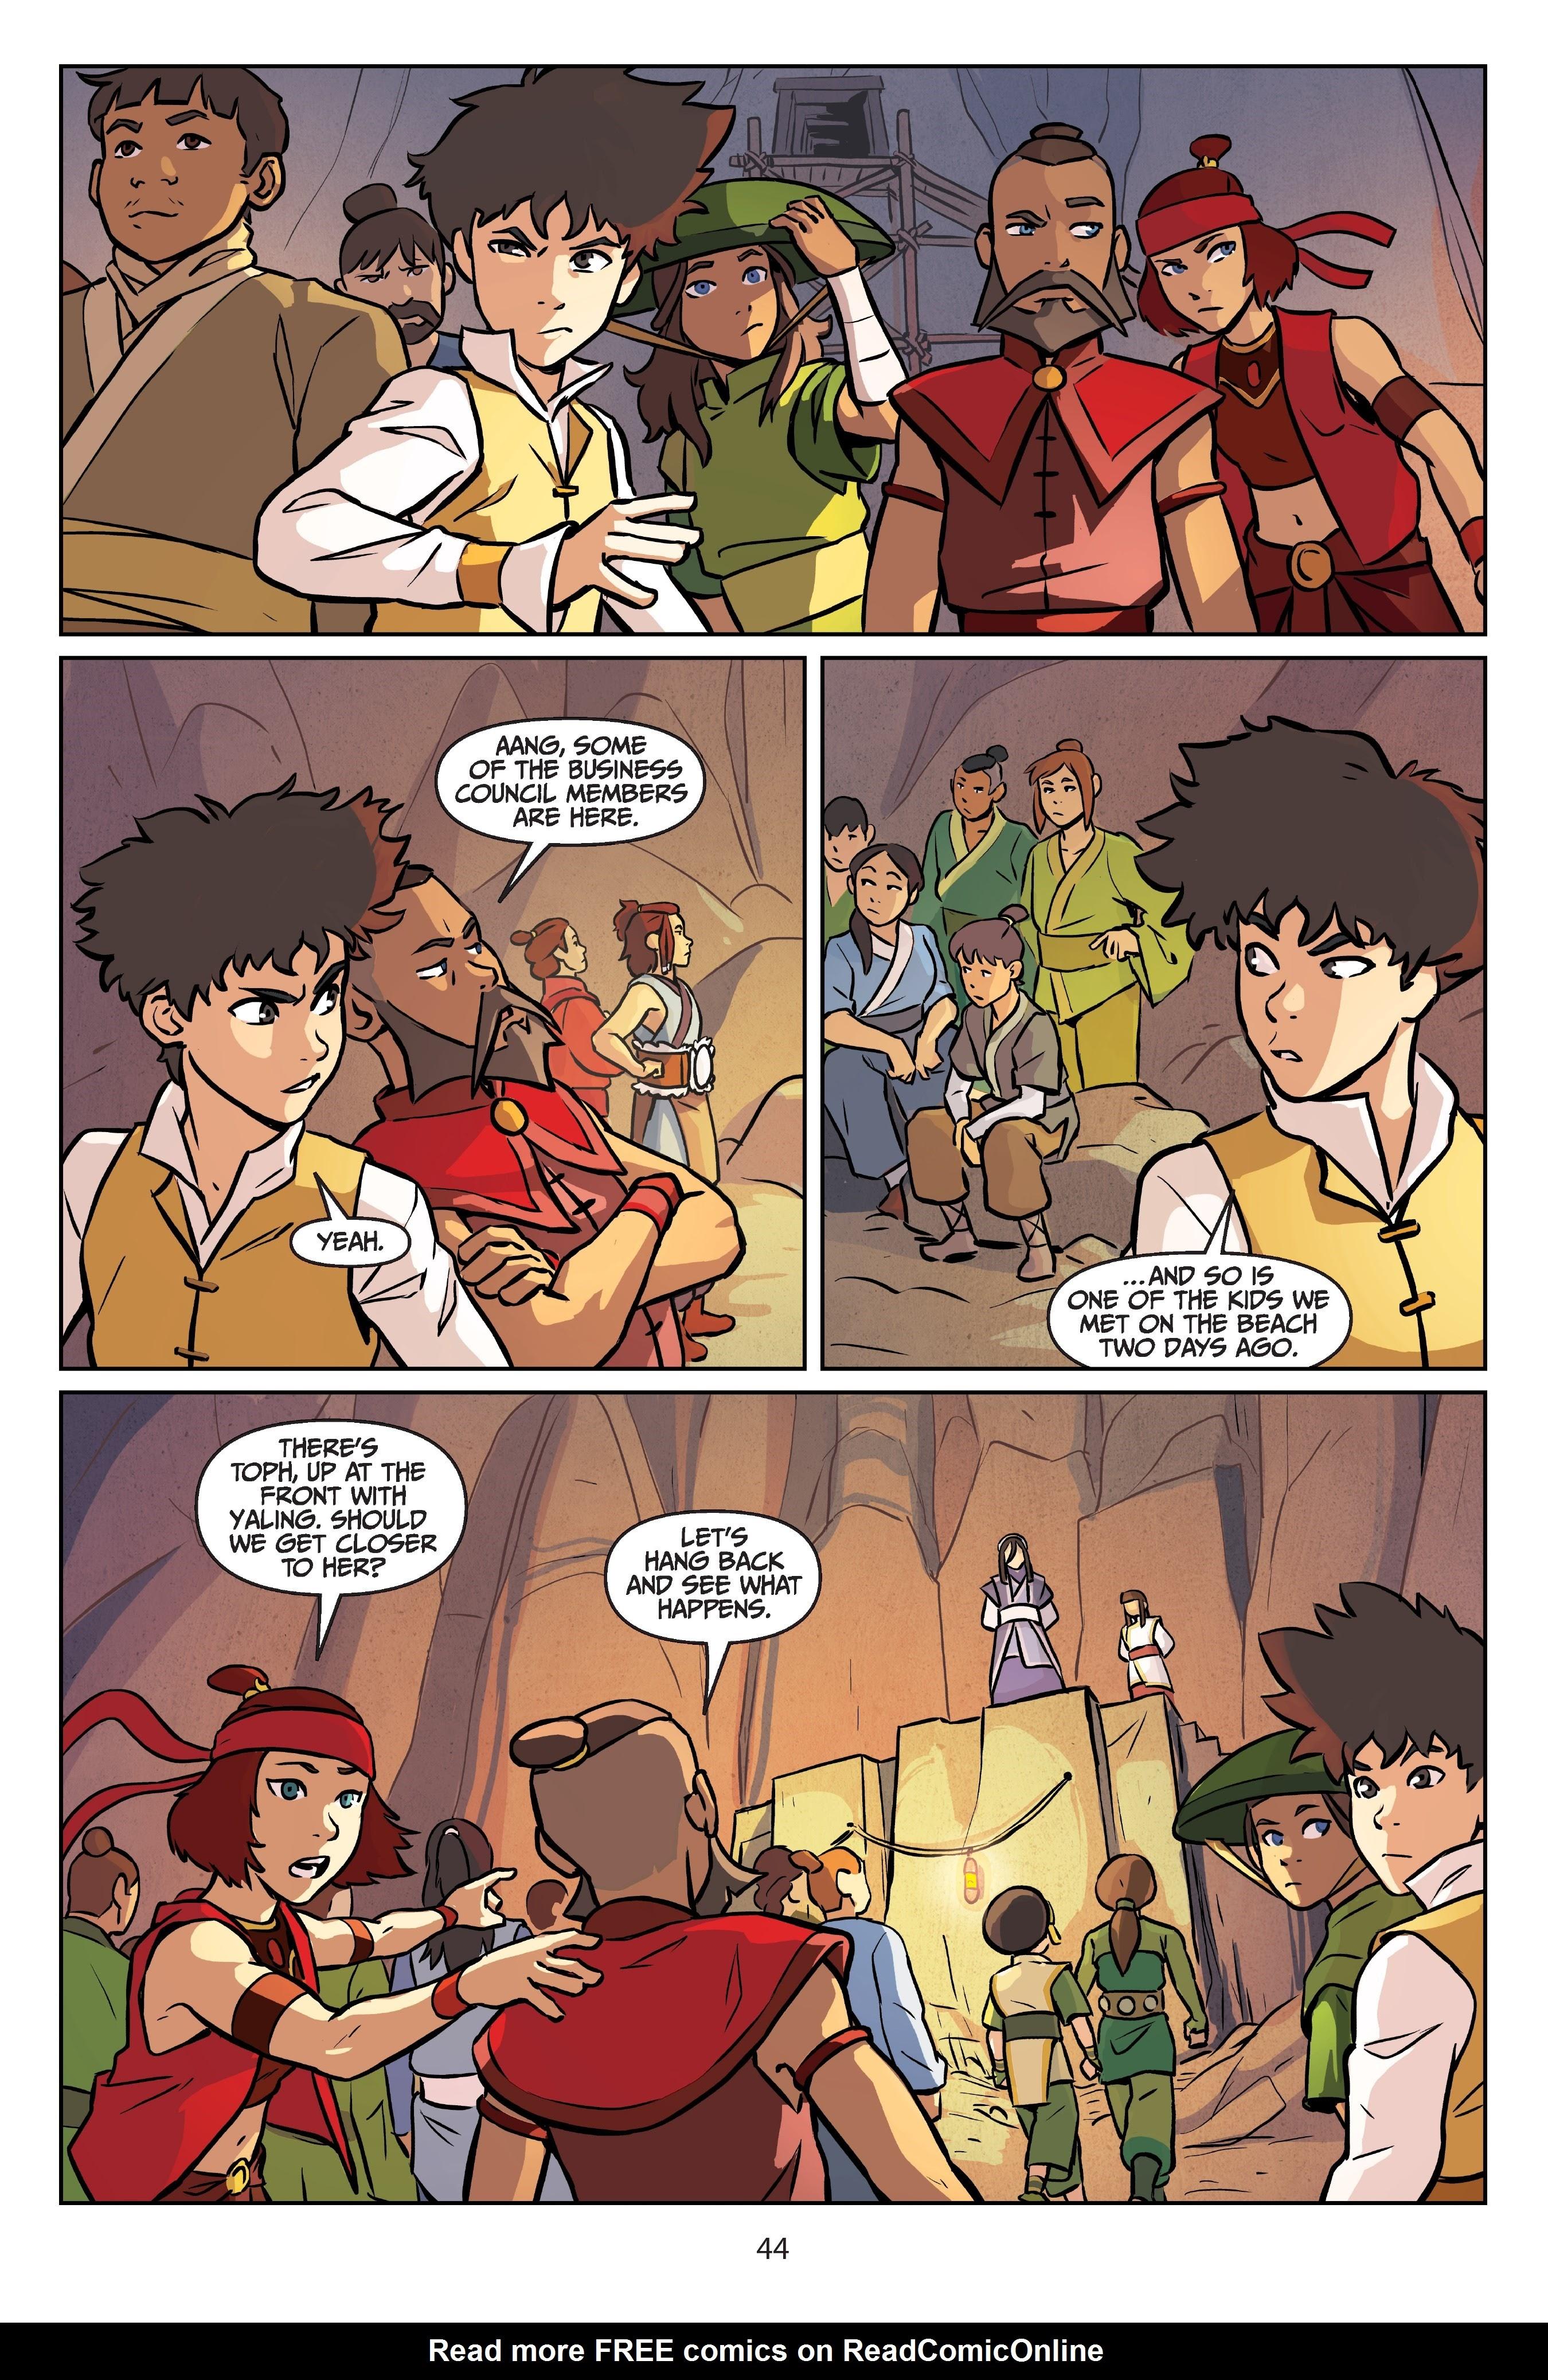 Nickelodeon Avatar: The Last Airbender - Imbalance TPB_2 Page 44